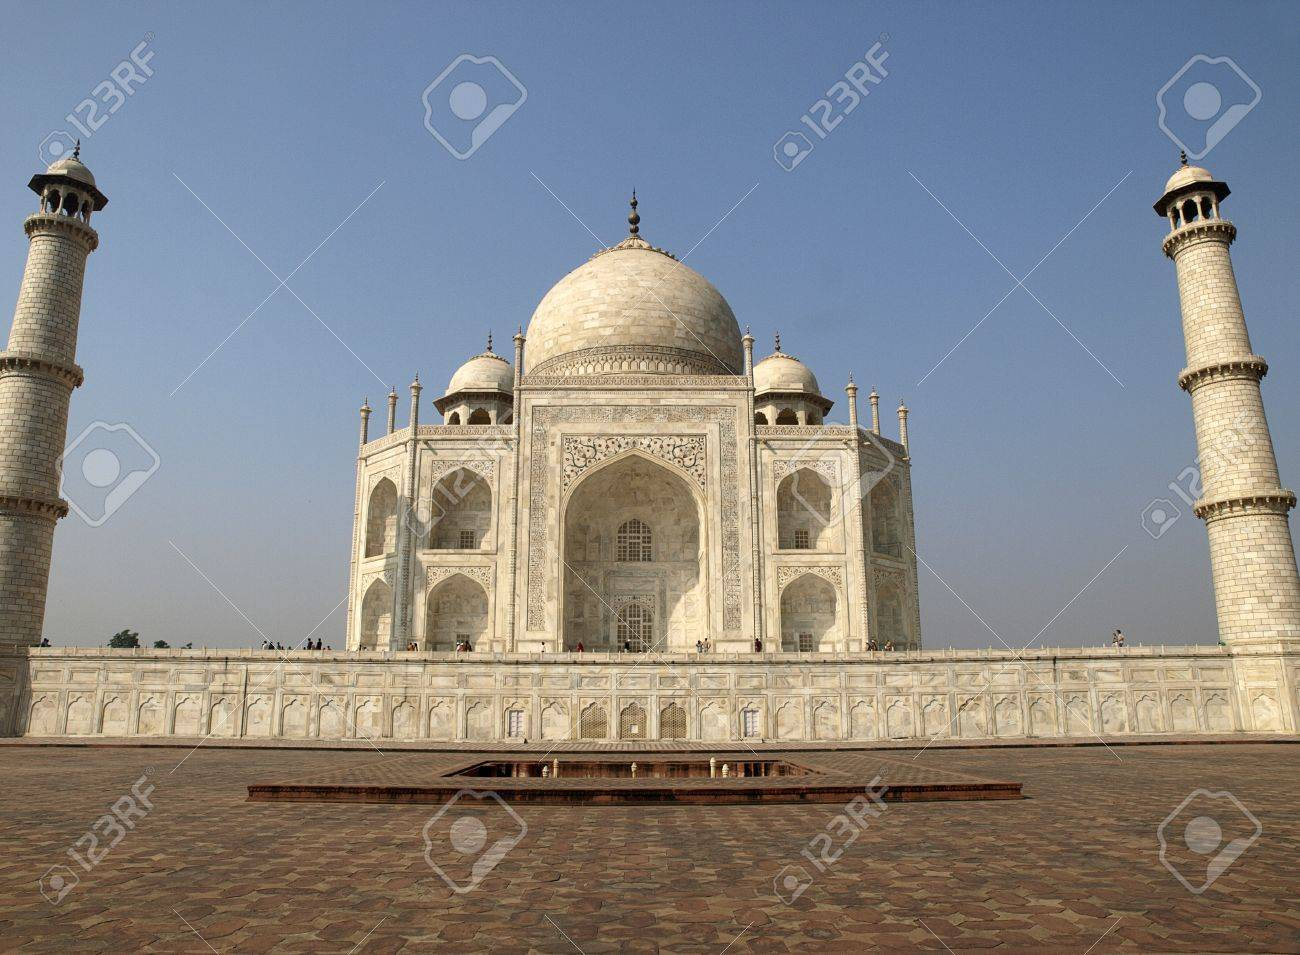 Beautiful Taj Mahal seen from the east side Stock Photo - 13629318